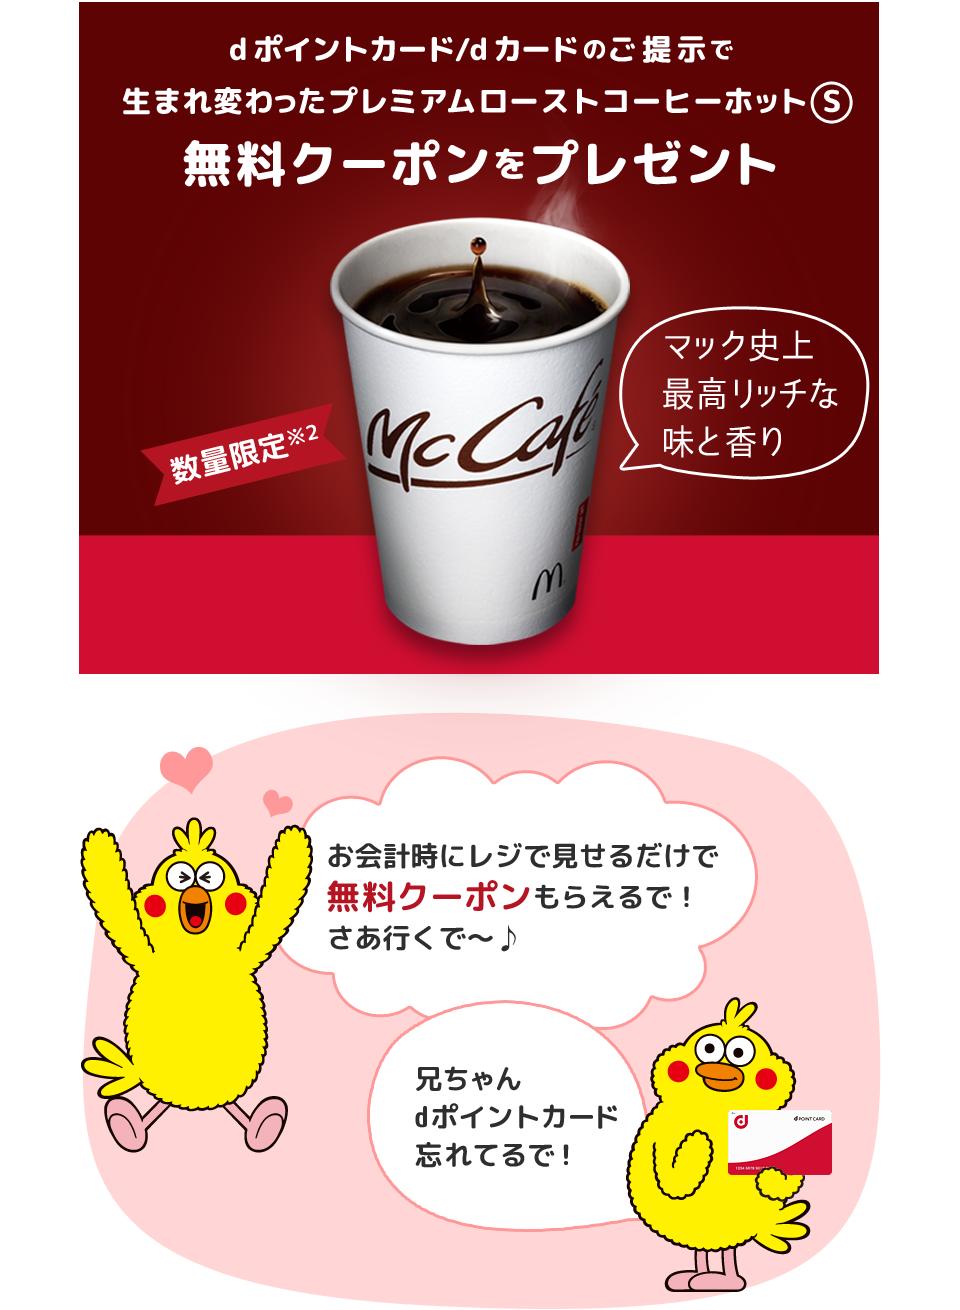 dpc_lp_mc04_coffee.png